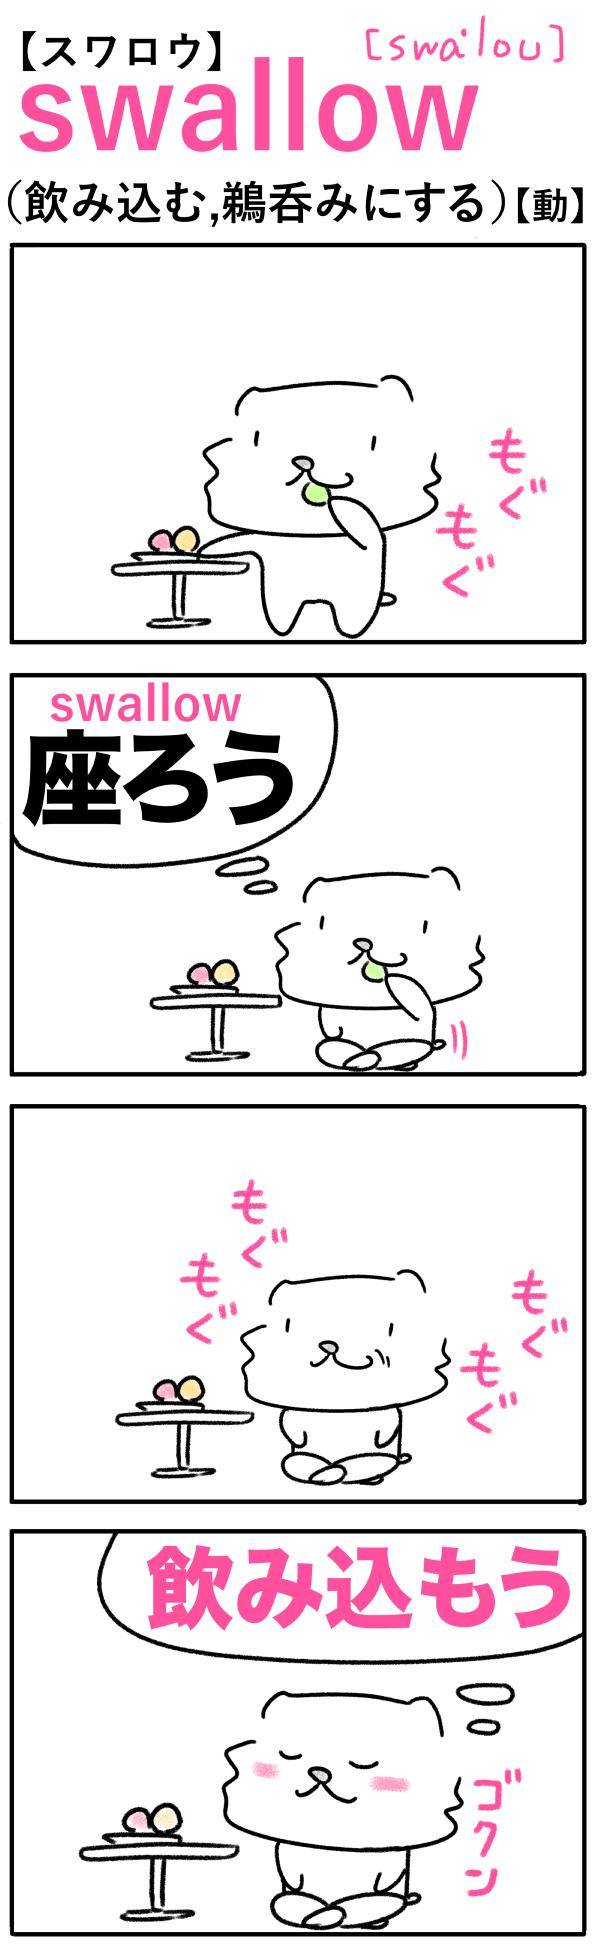 swallow(飲み込む)の語呂合わせ英単語